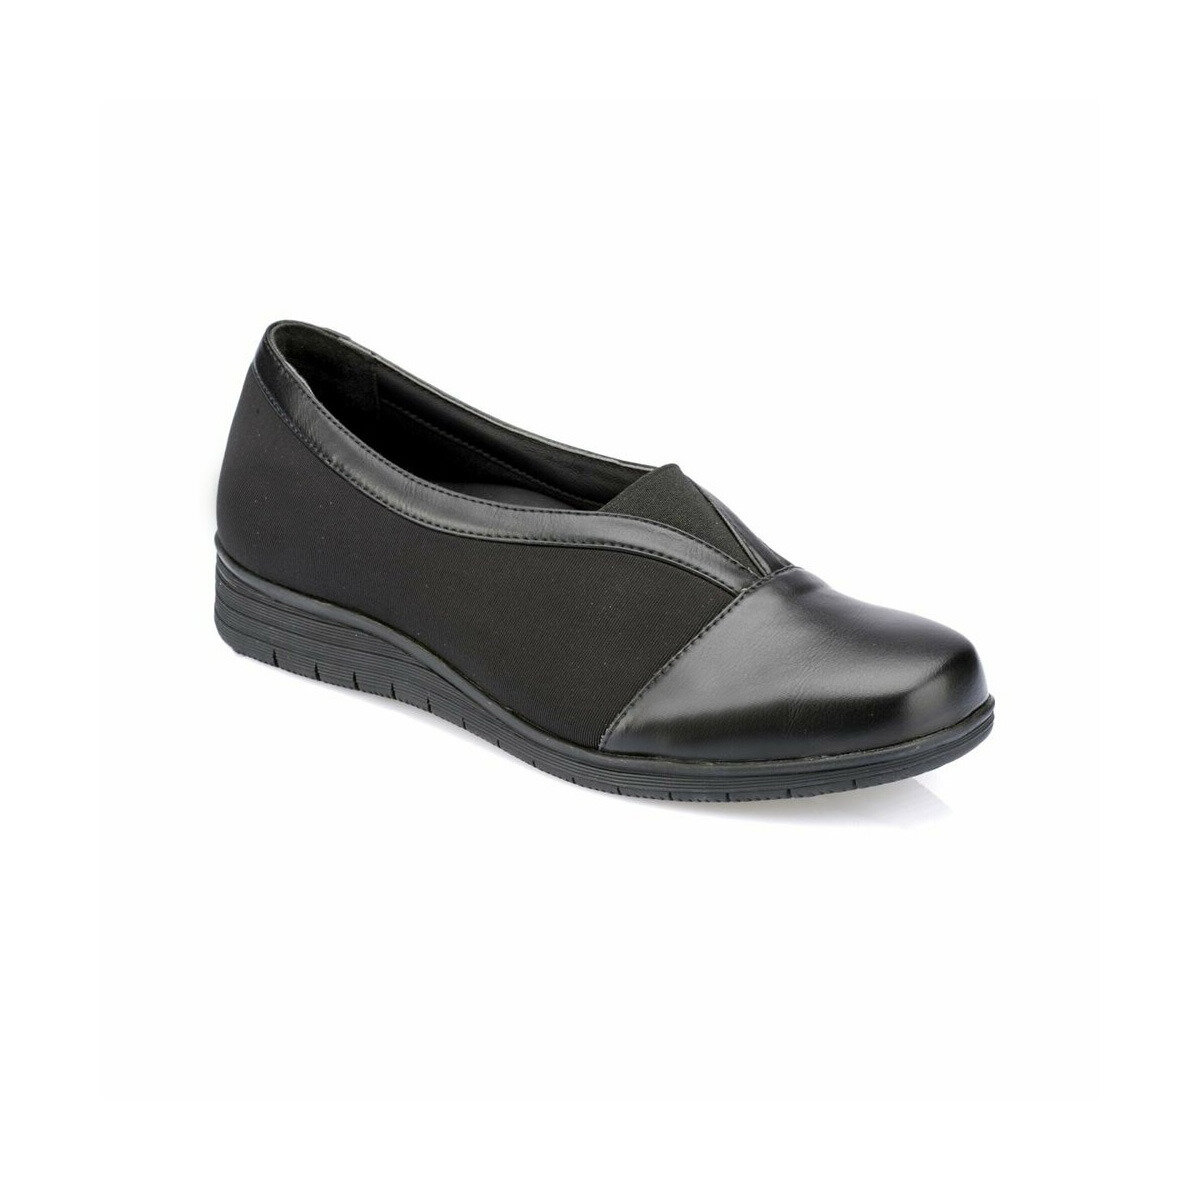 FLO 82. 100175.Z Black Women Shoes Polaris 5 Point